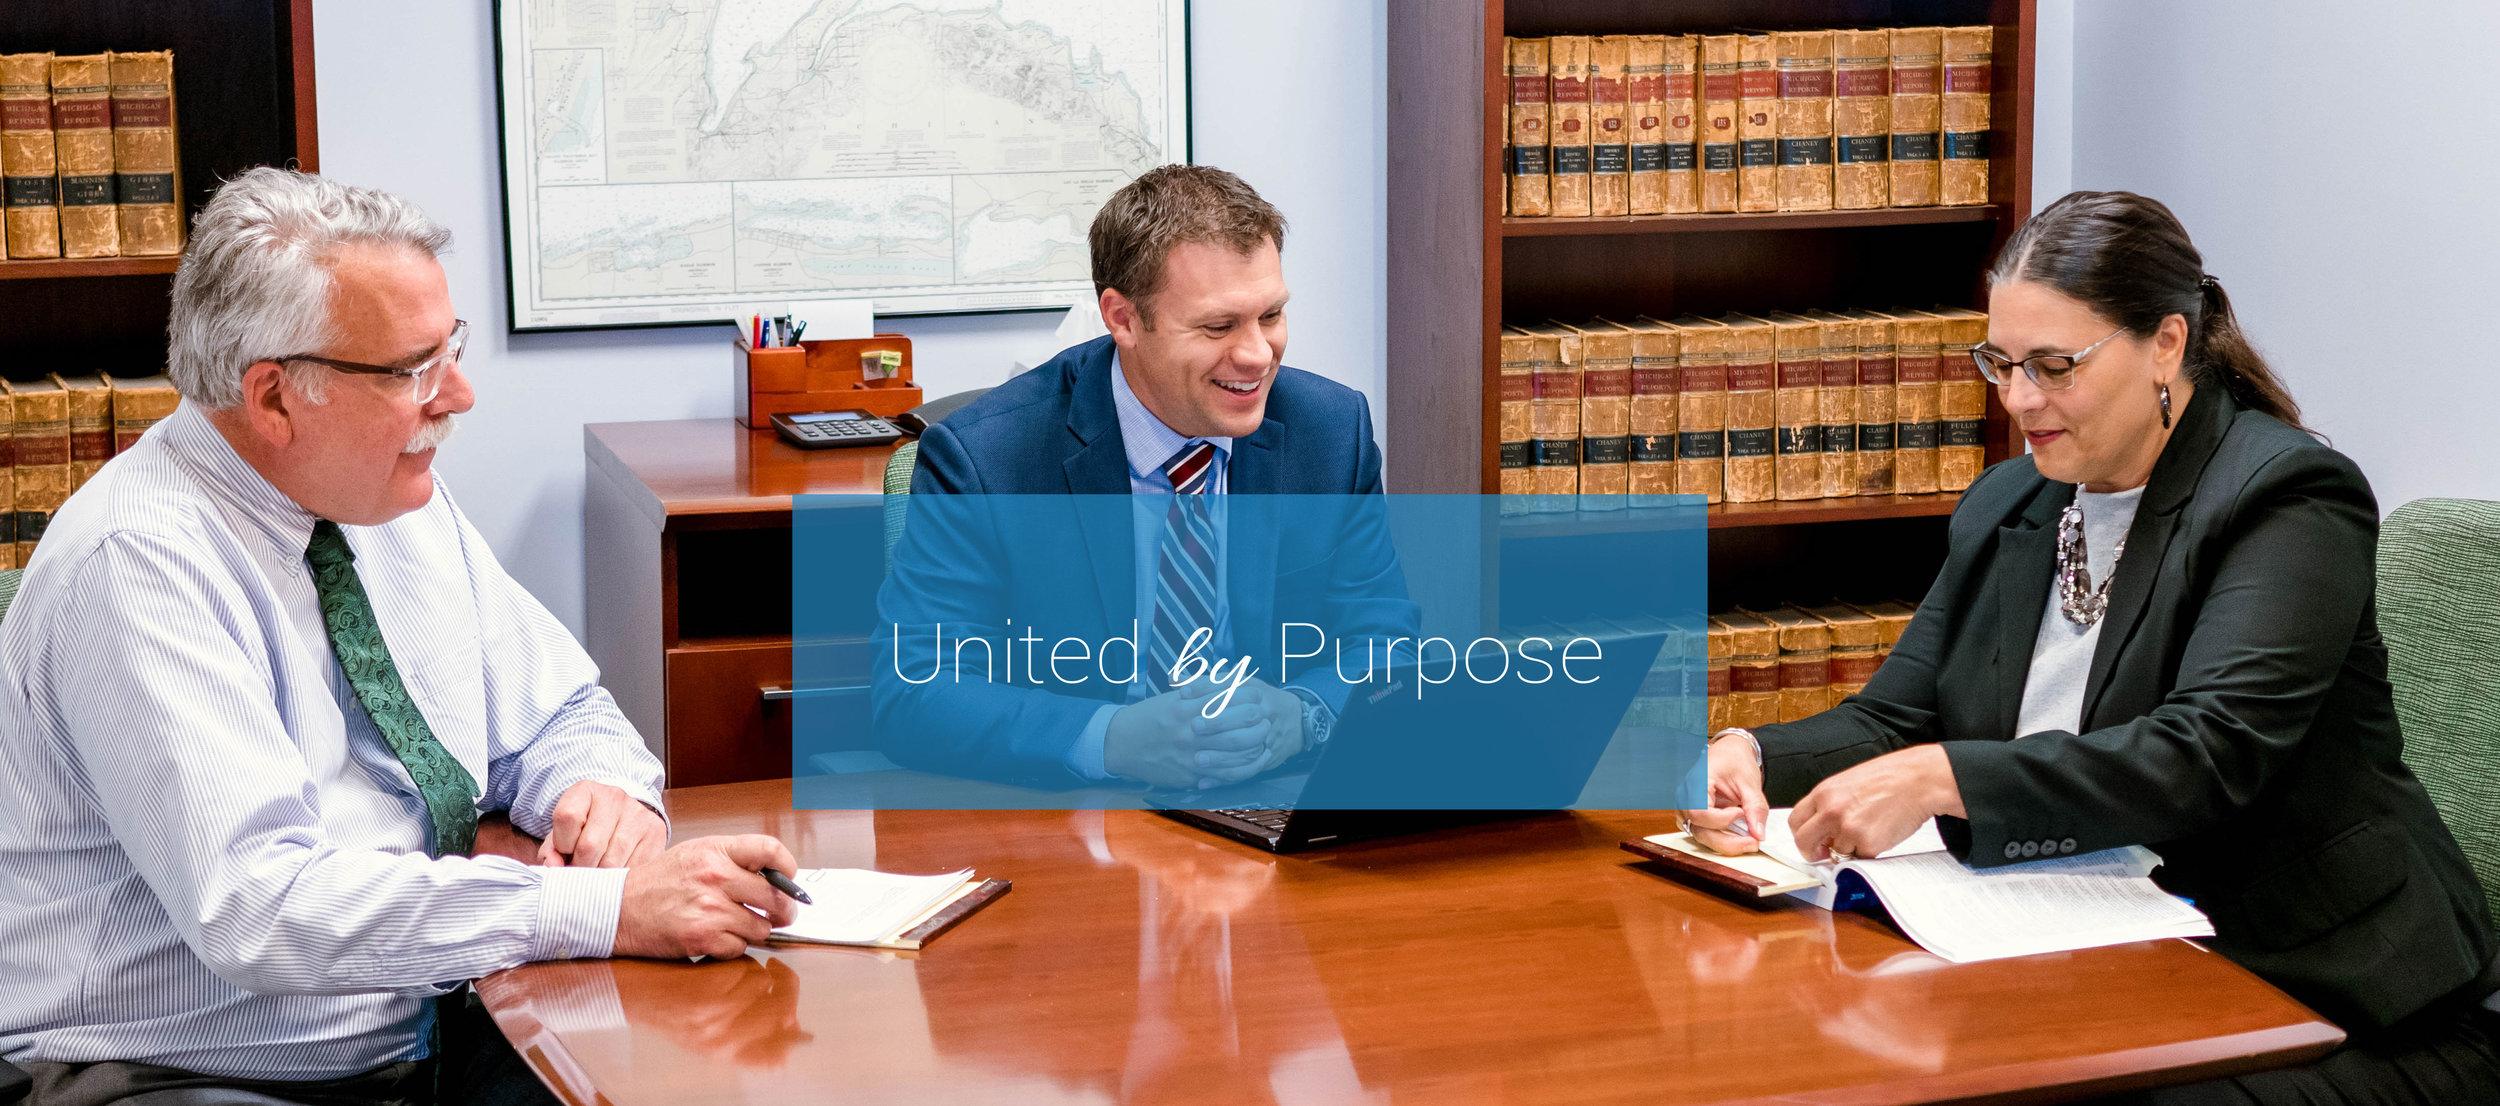 2018-ParkerHarvey-unitedbypurpose.jpg